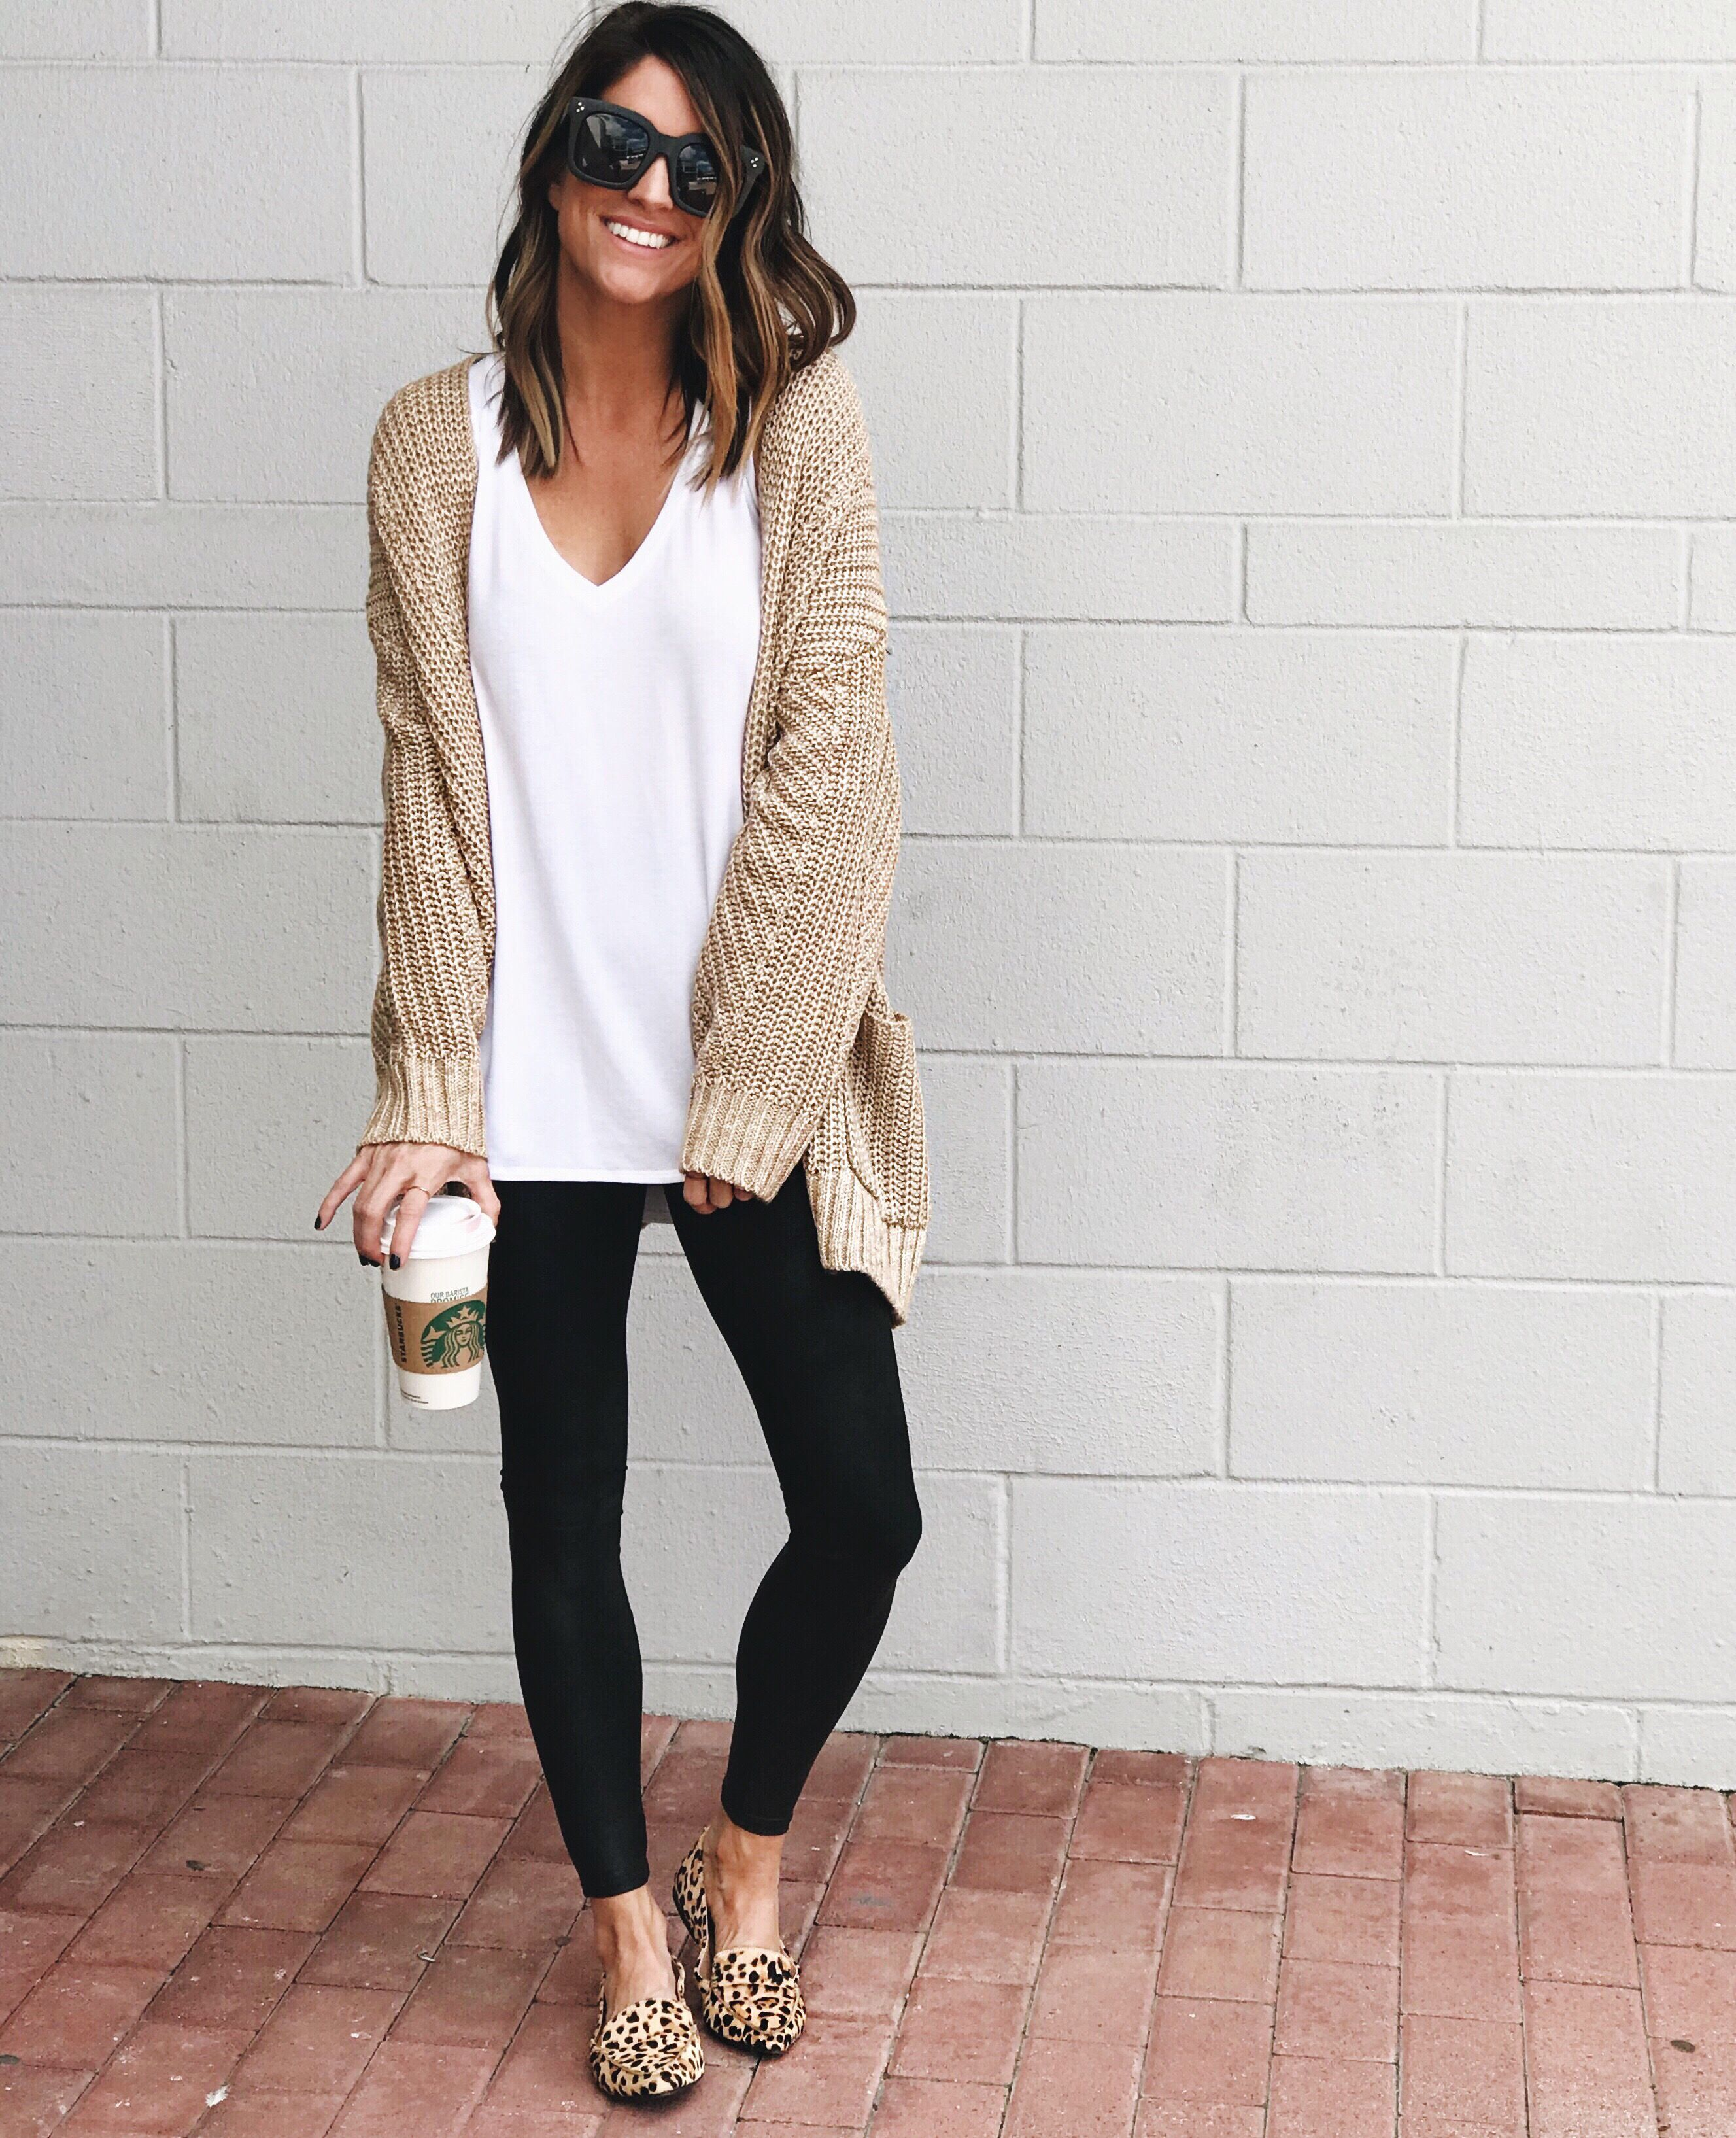 SEVENTY Ways To Style Leggings! - The Sister Studio